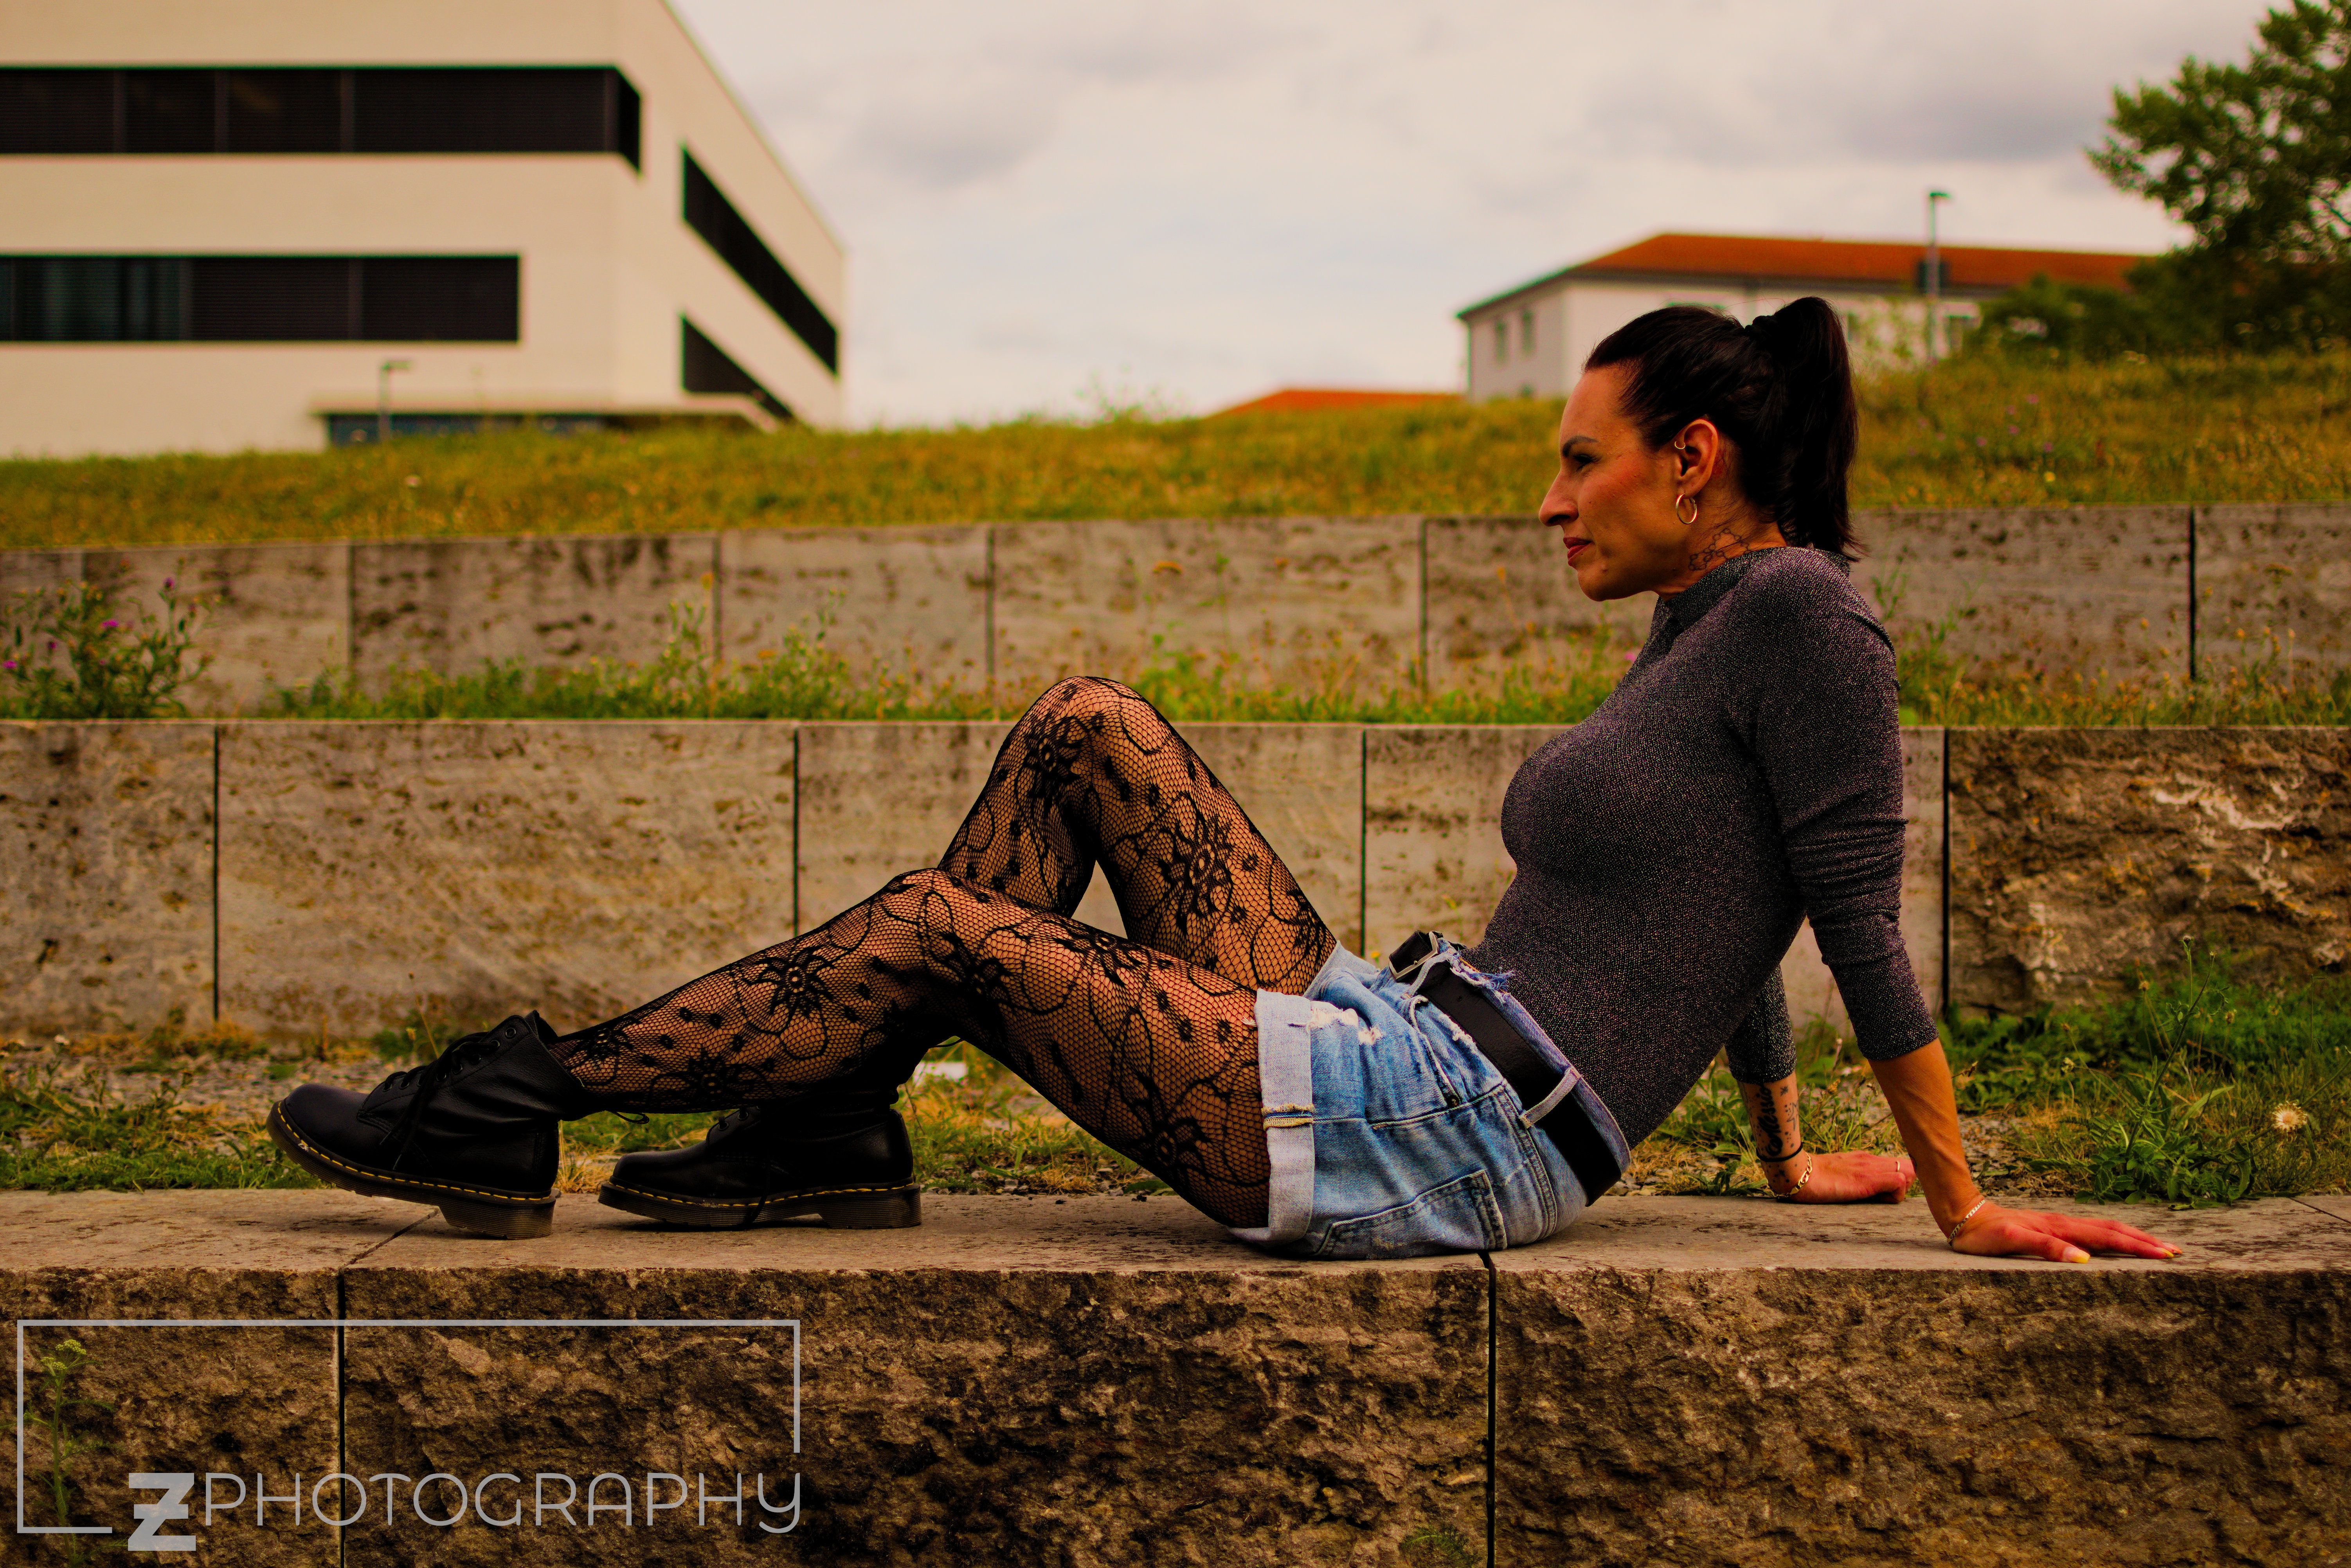 Model: Antonella Somma